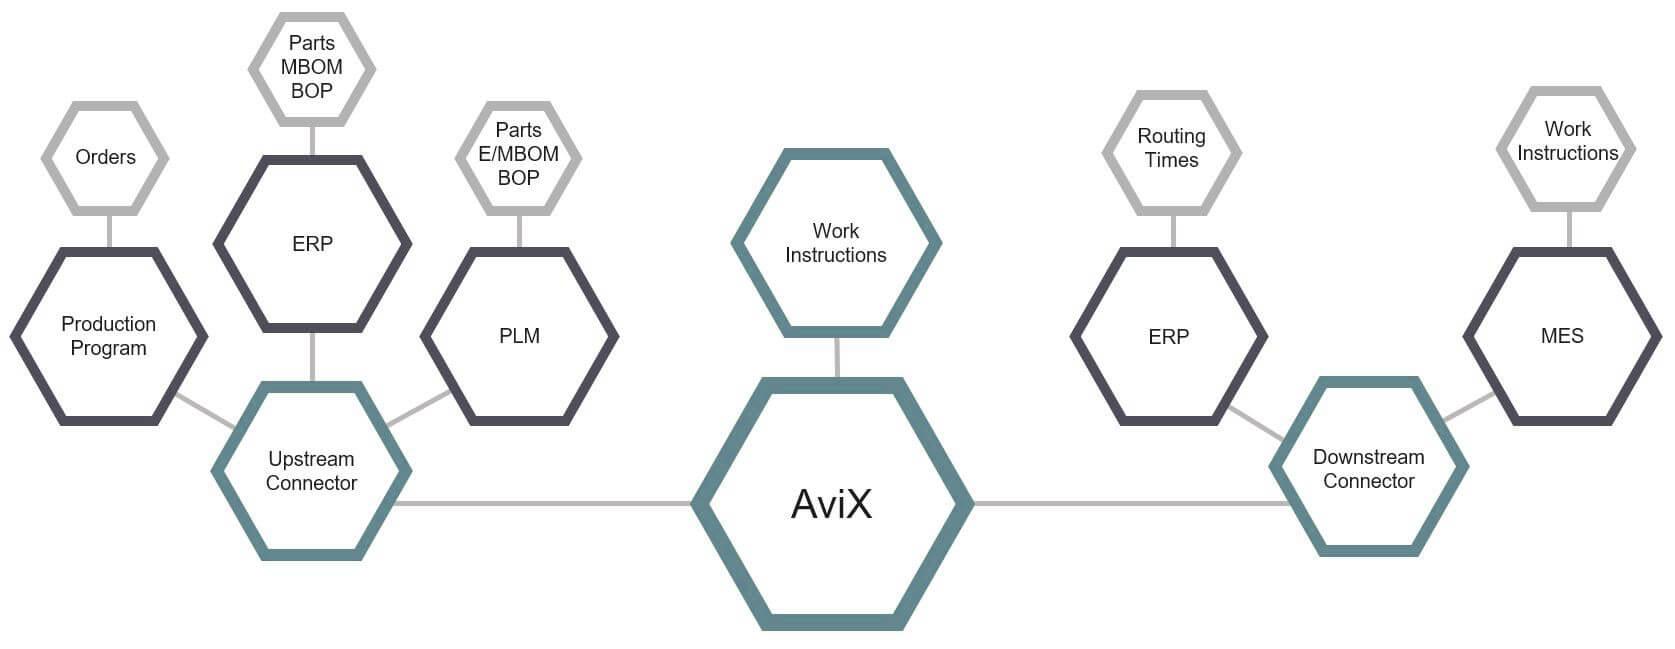 AviX Connector